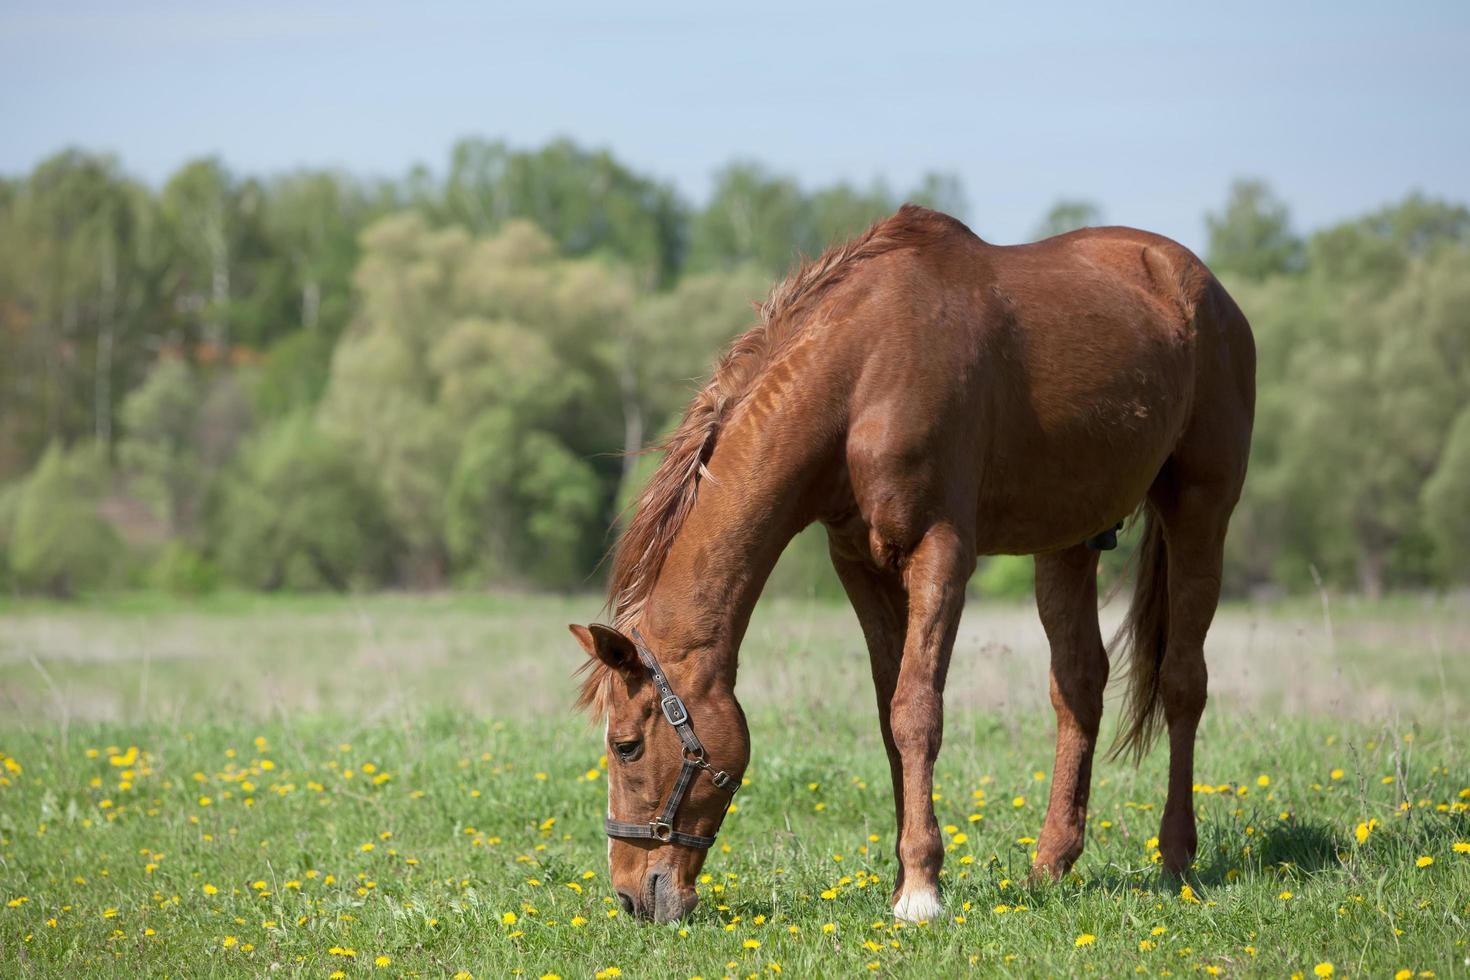 braunes Pferd weiden lassen foto